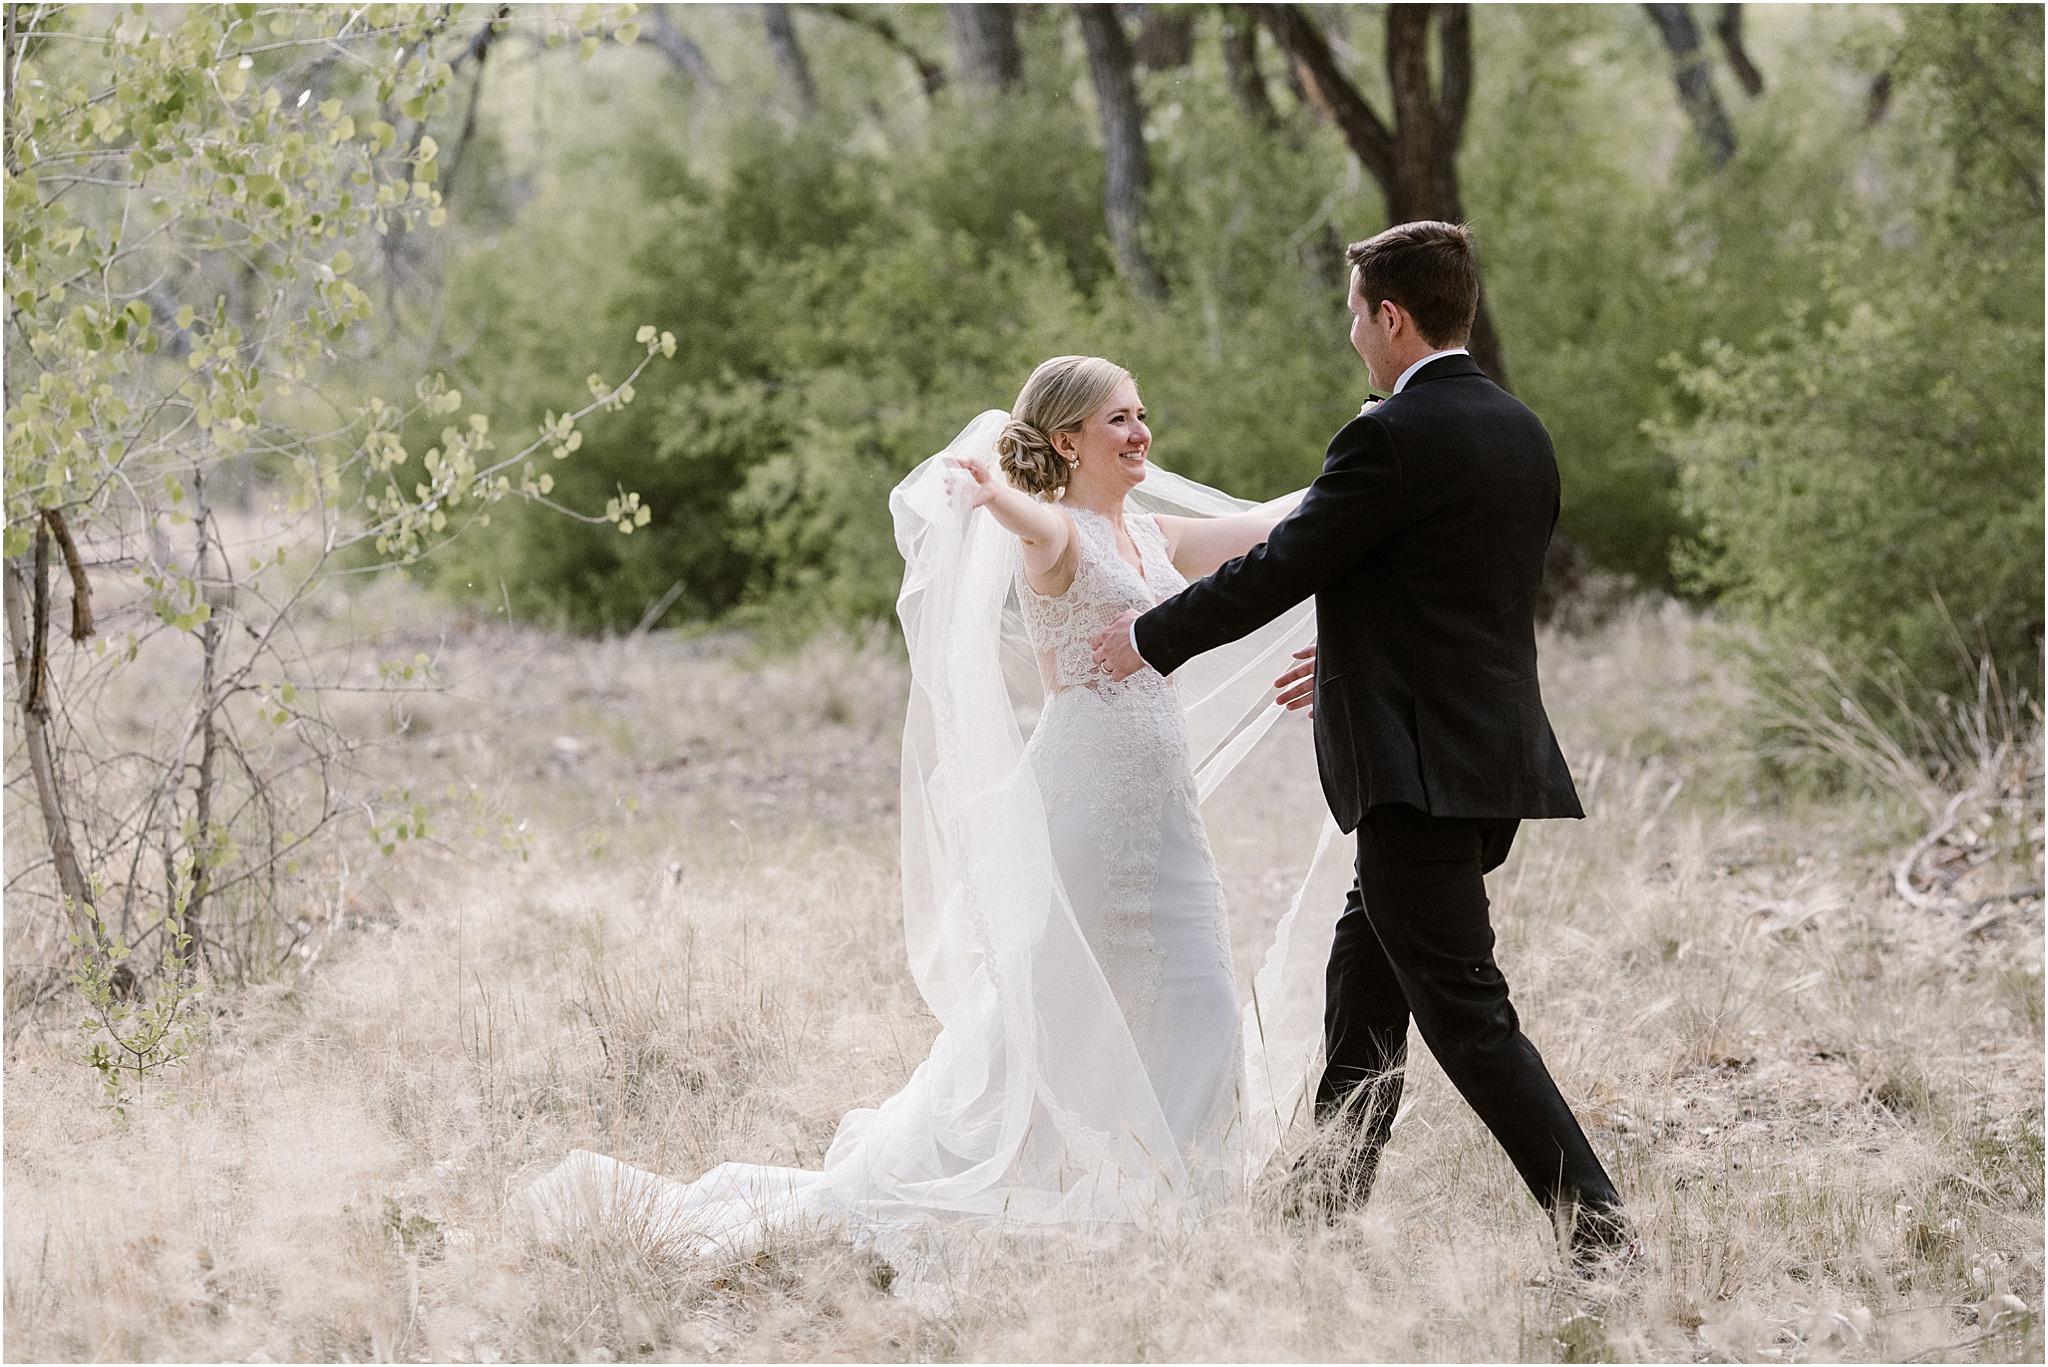 JENNA_JEROME_BLUE ROSE PHOTOGRAPHY_ABQ WEDDING_32